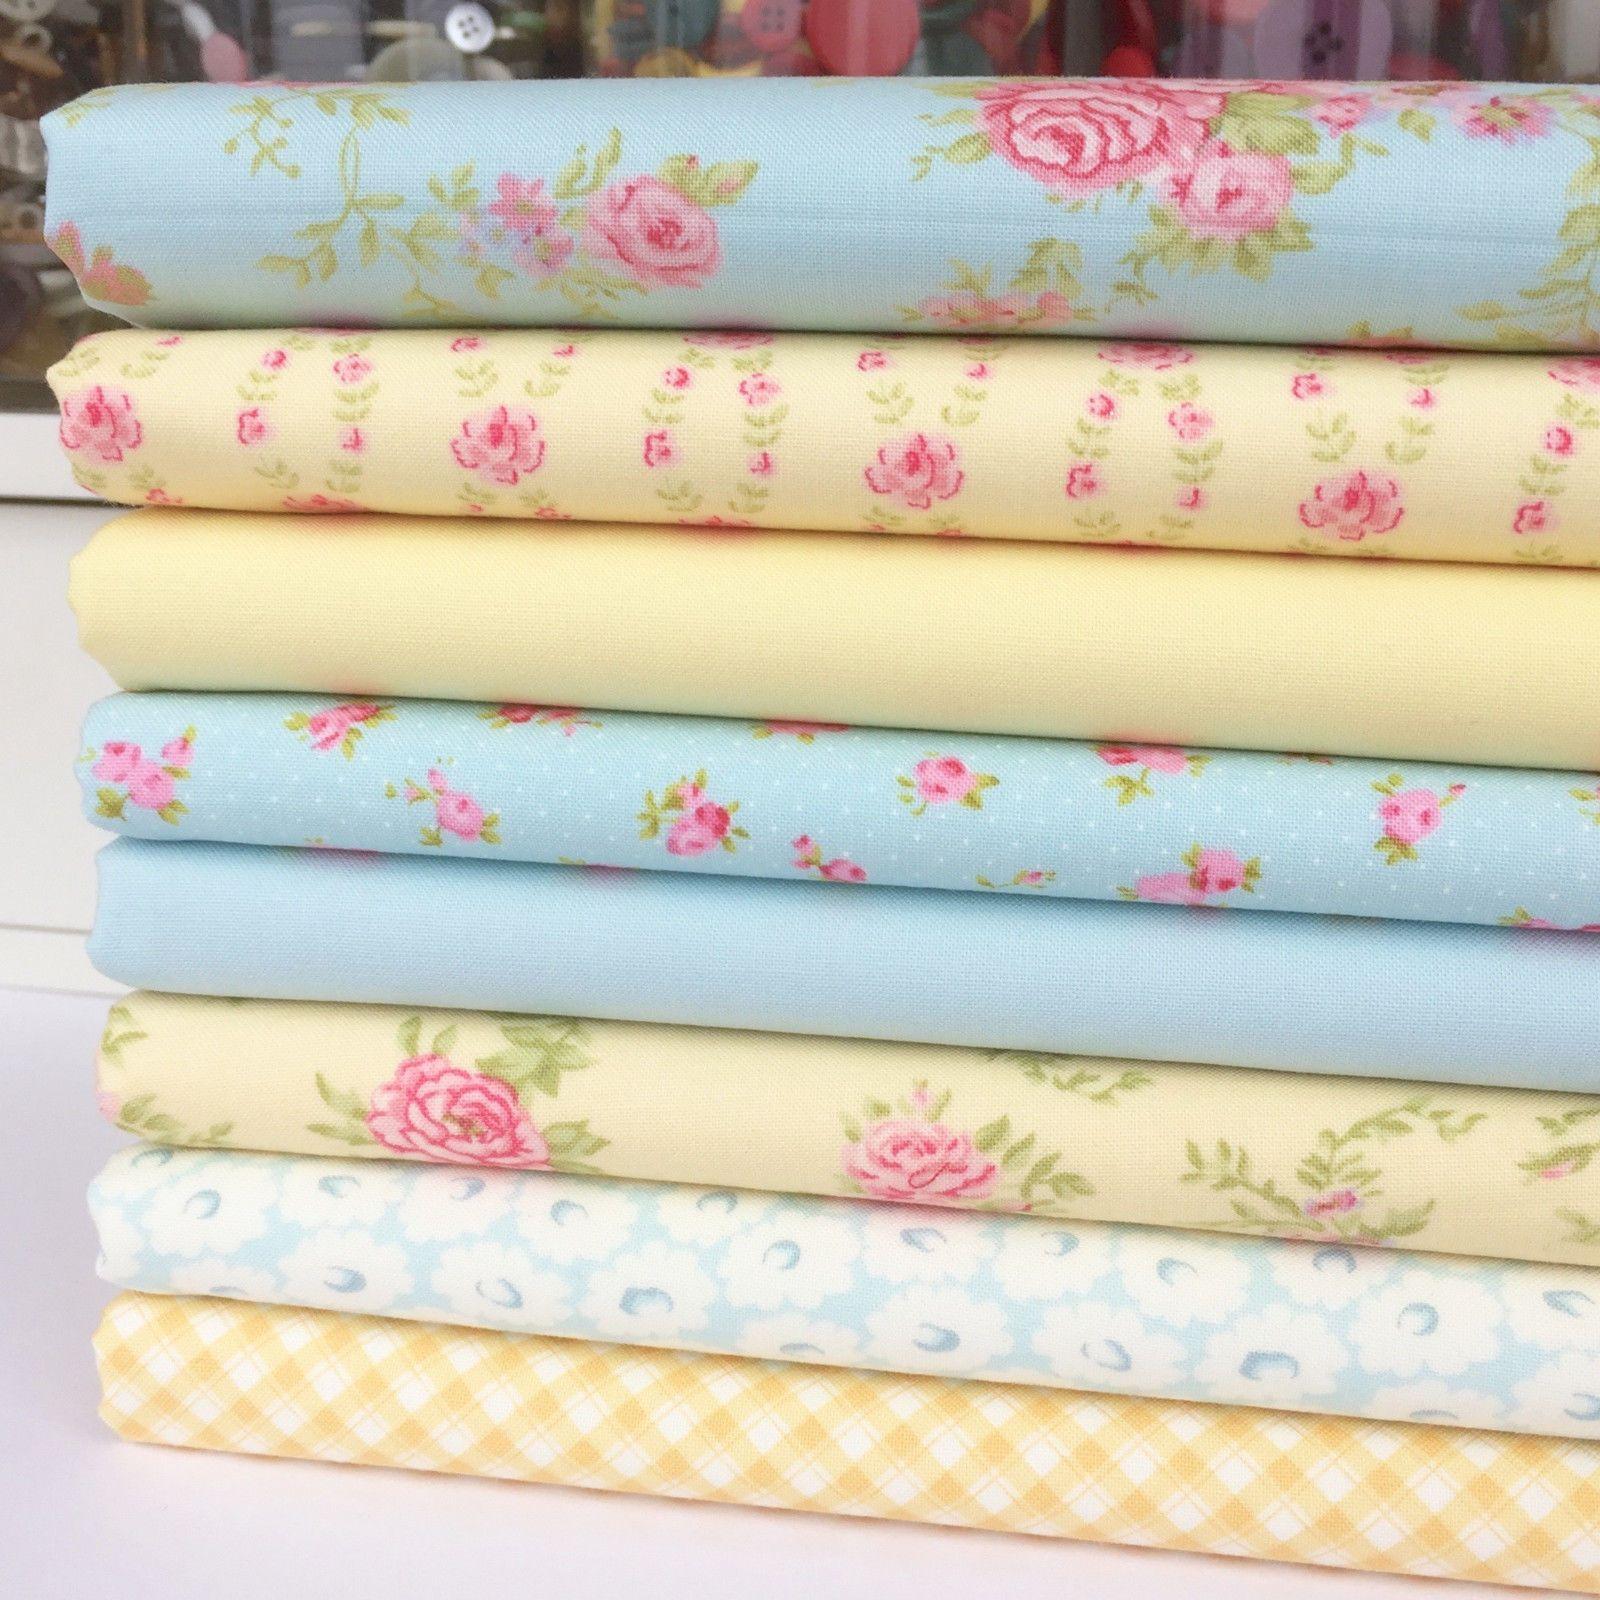 NEW 8 pcs BUNDLE pink FQ COTTON FABRIC floral Joblot Mixed Crafts 50 x 40 cm